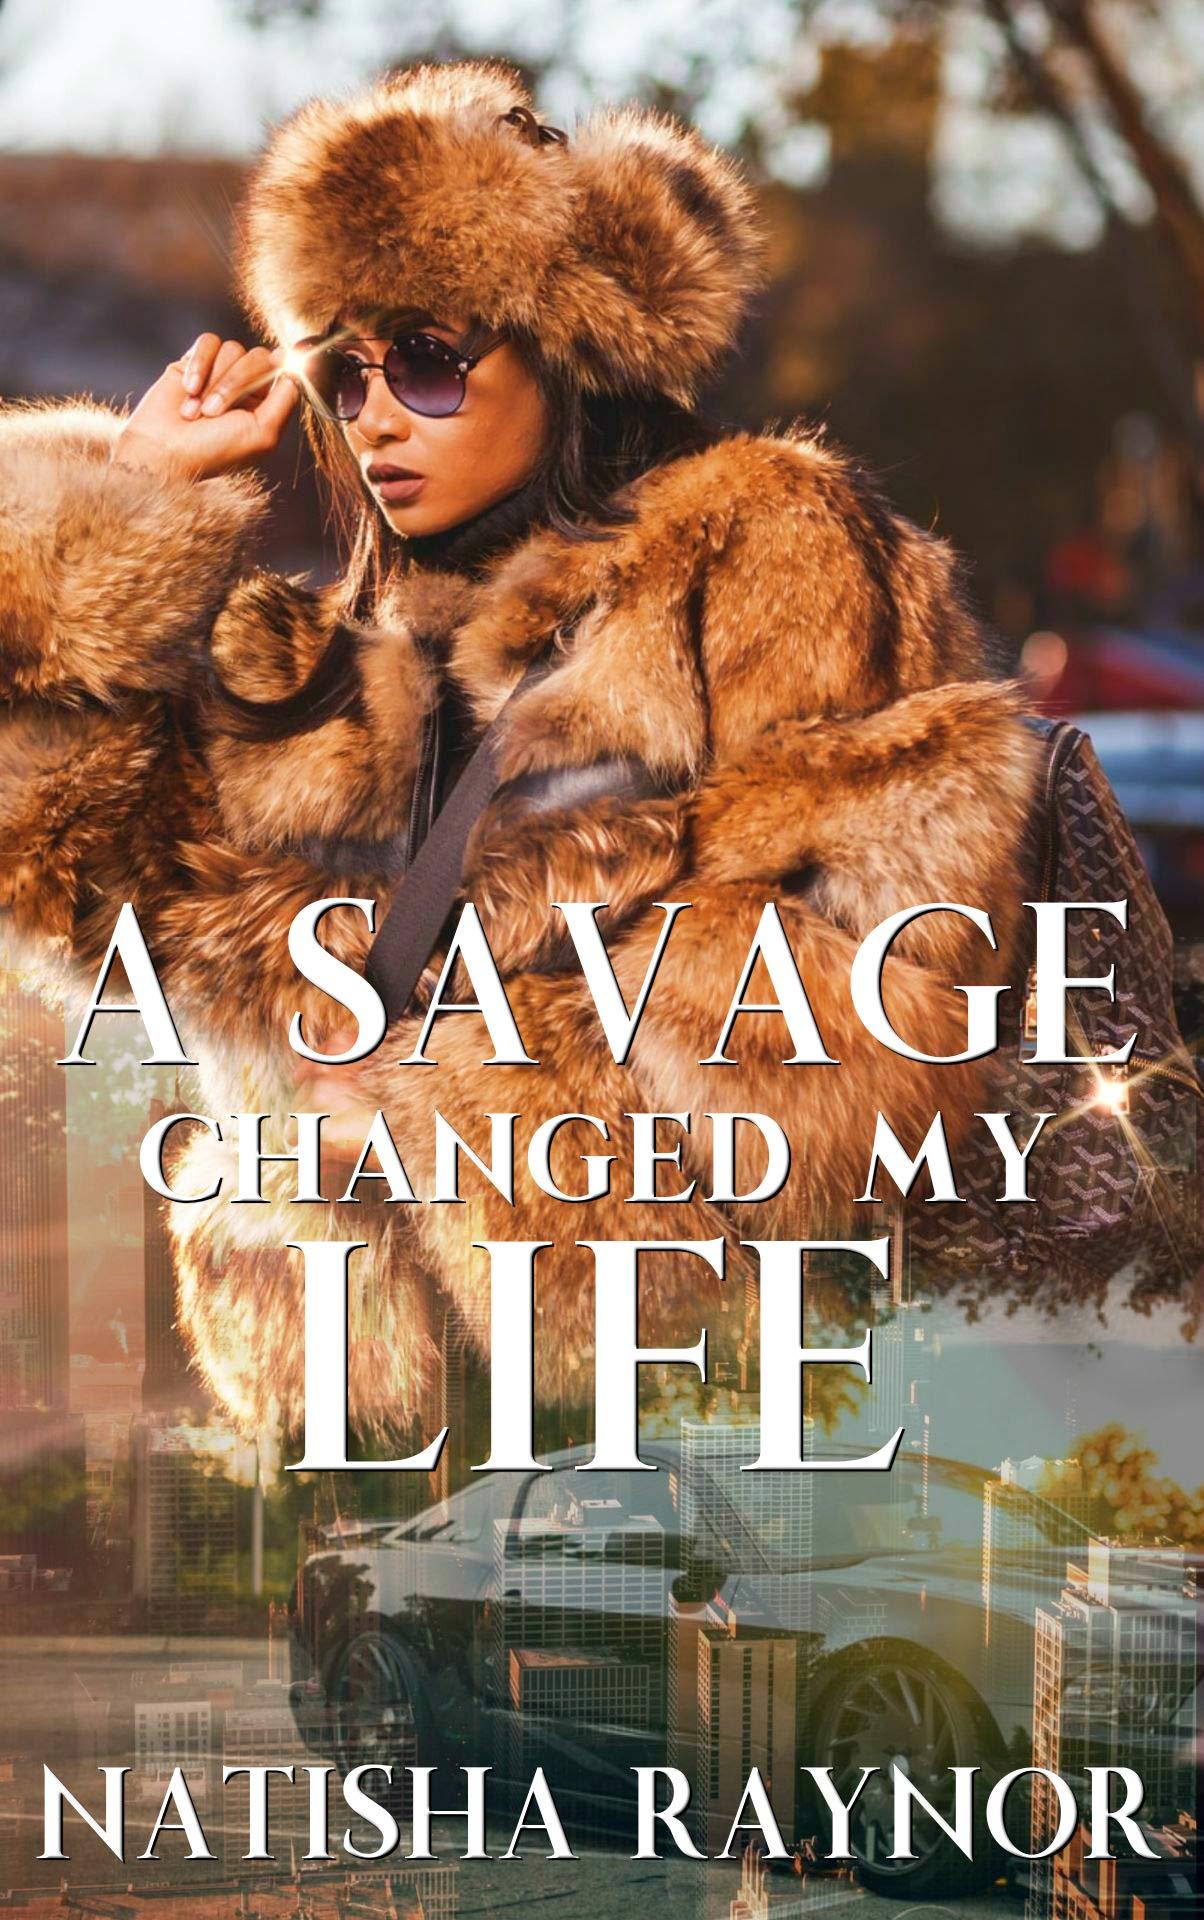 A Savage Changed My Life